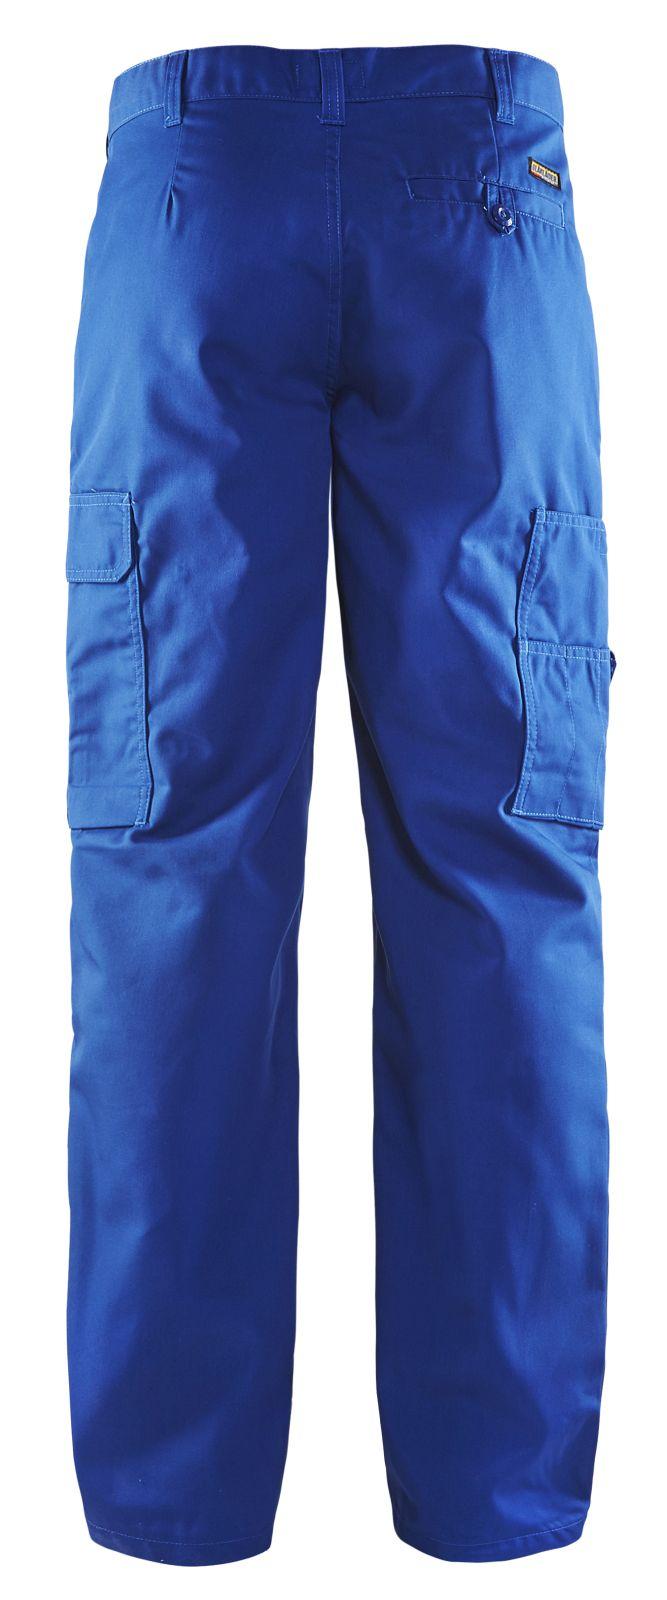 Blaklader Werkbroeken 14001800 korenblauw(8500)